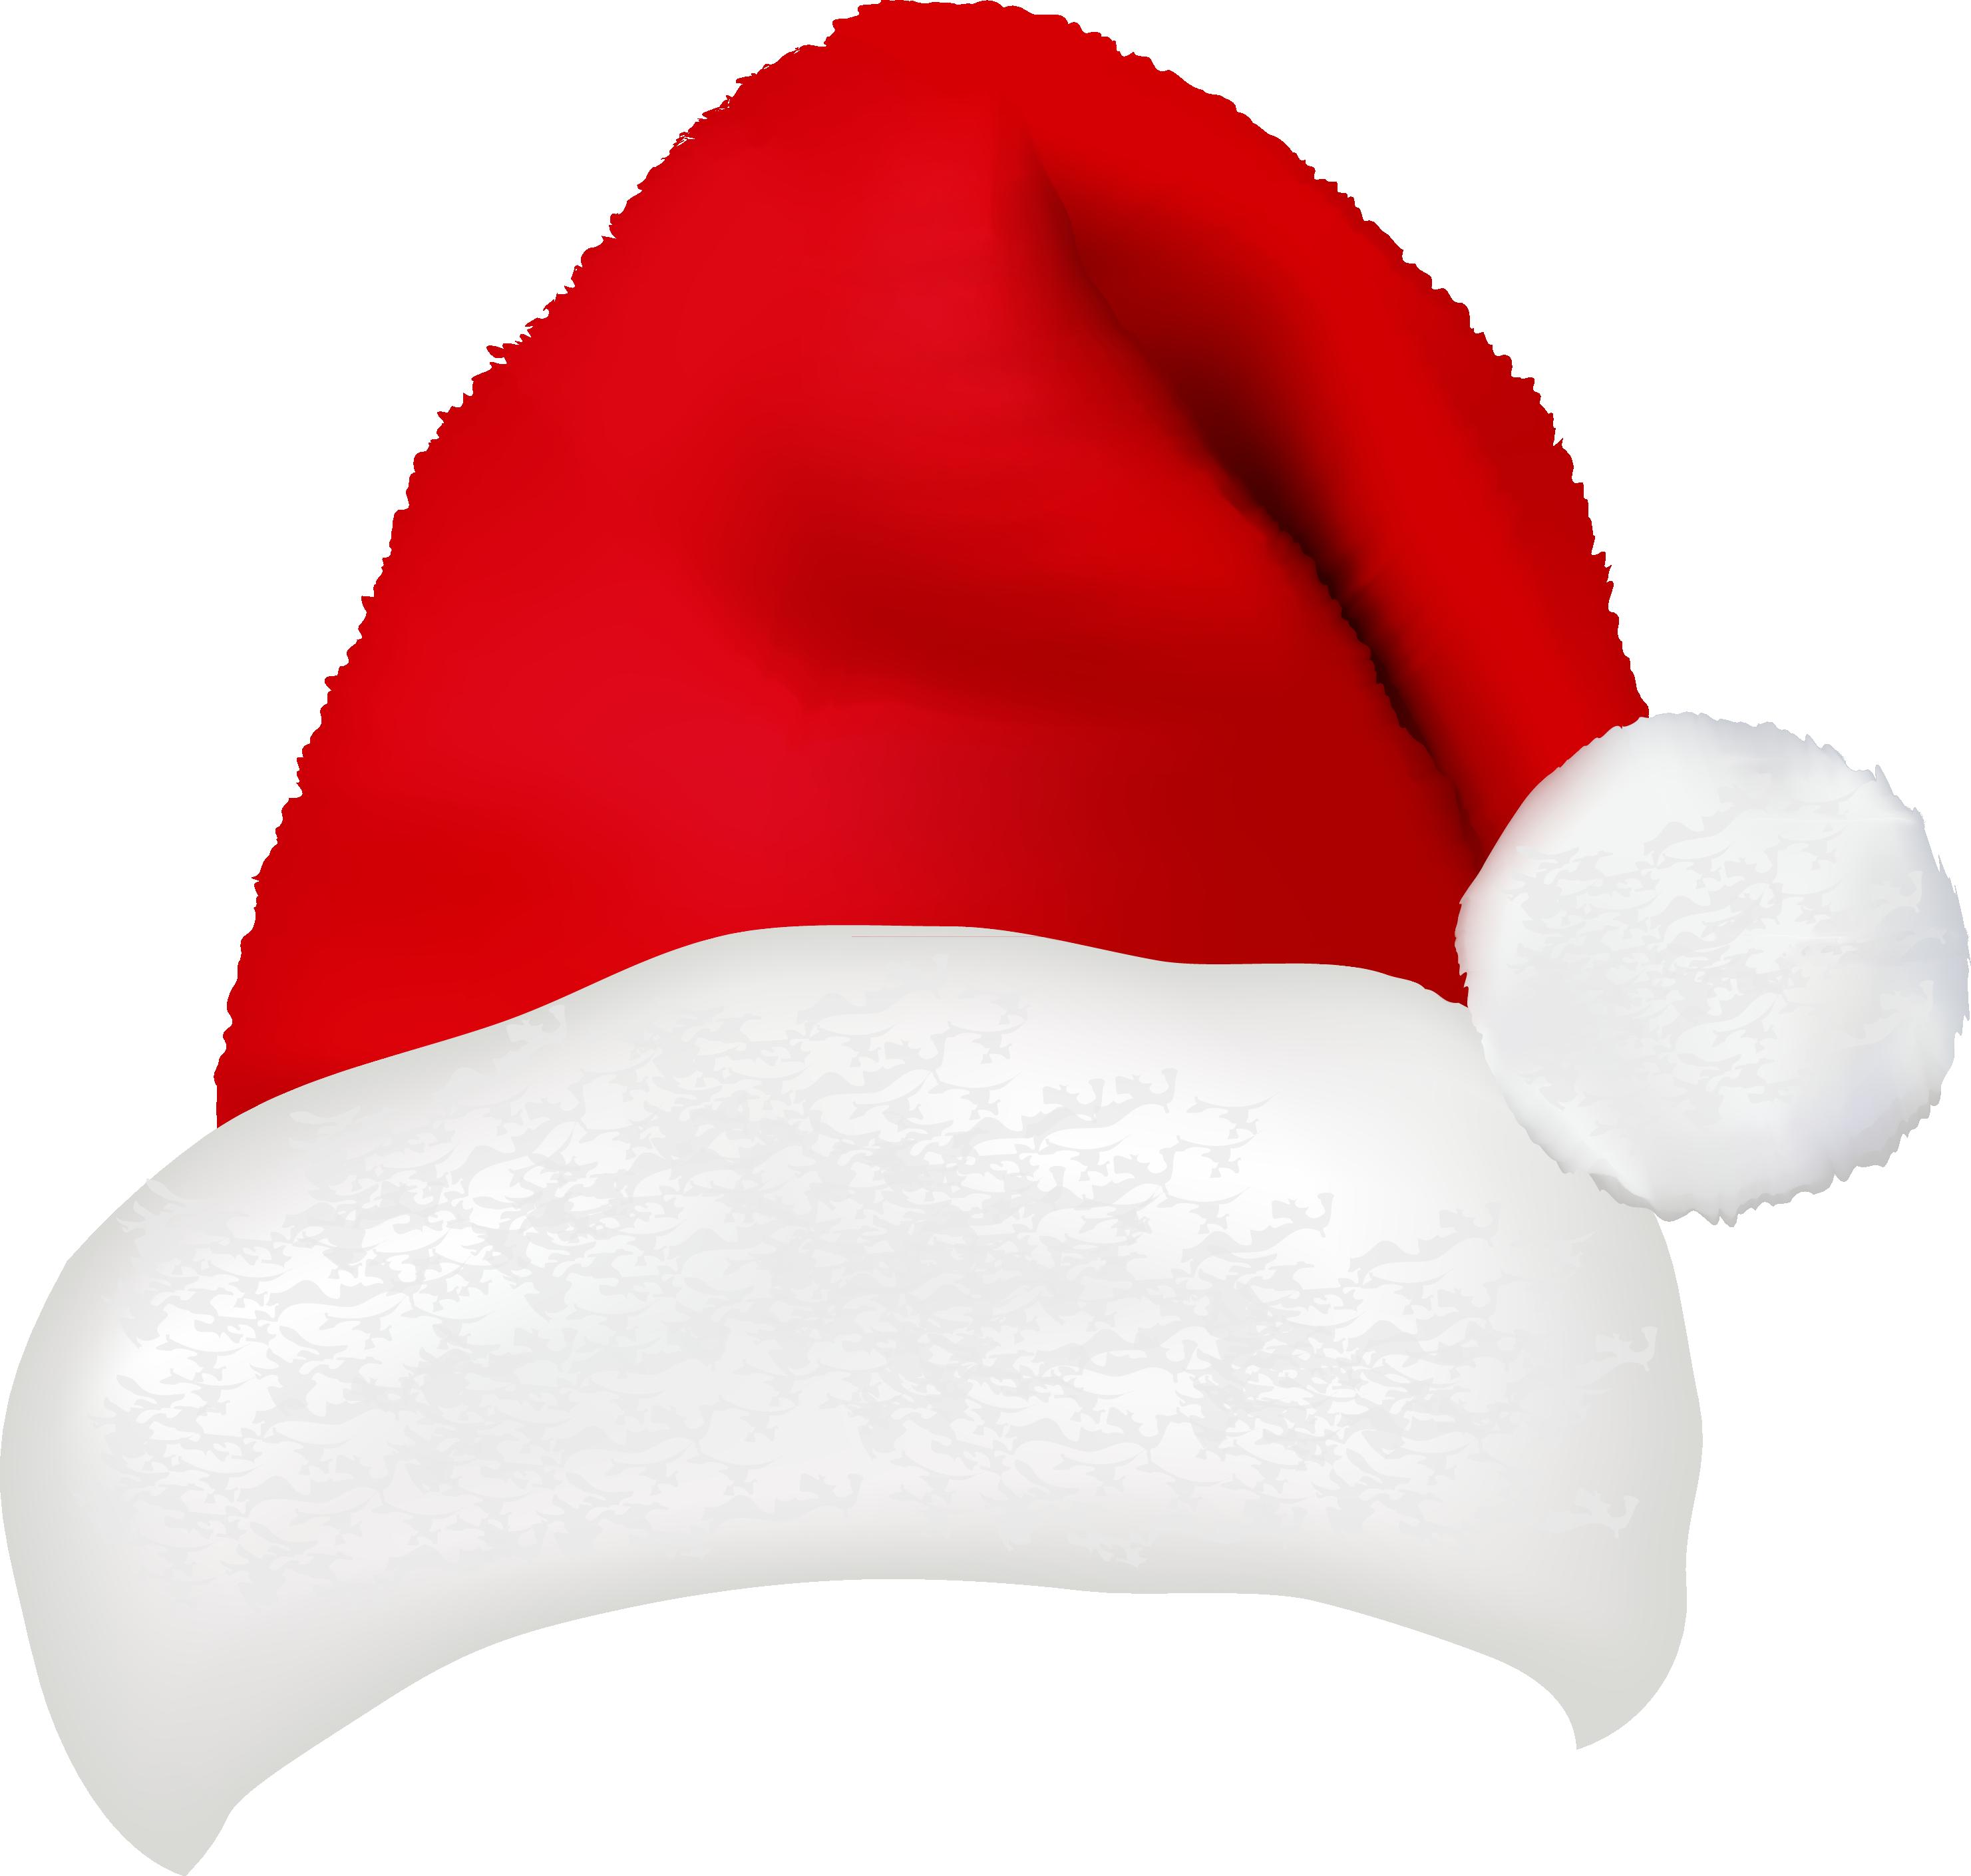 Картинка новогодней шапки деда мороза